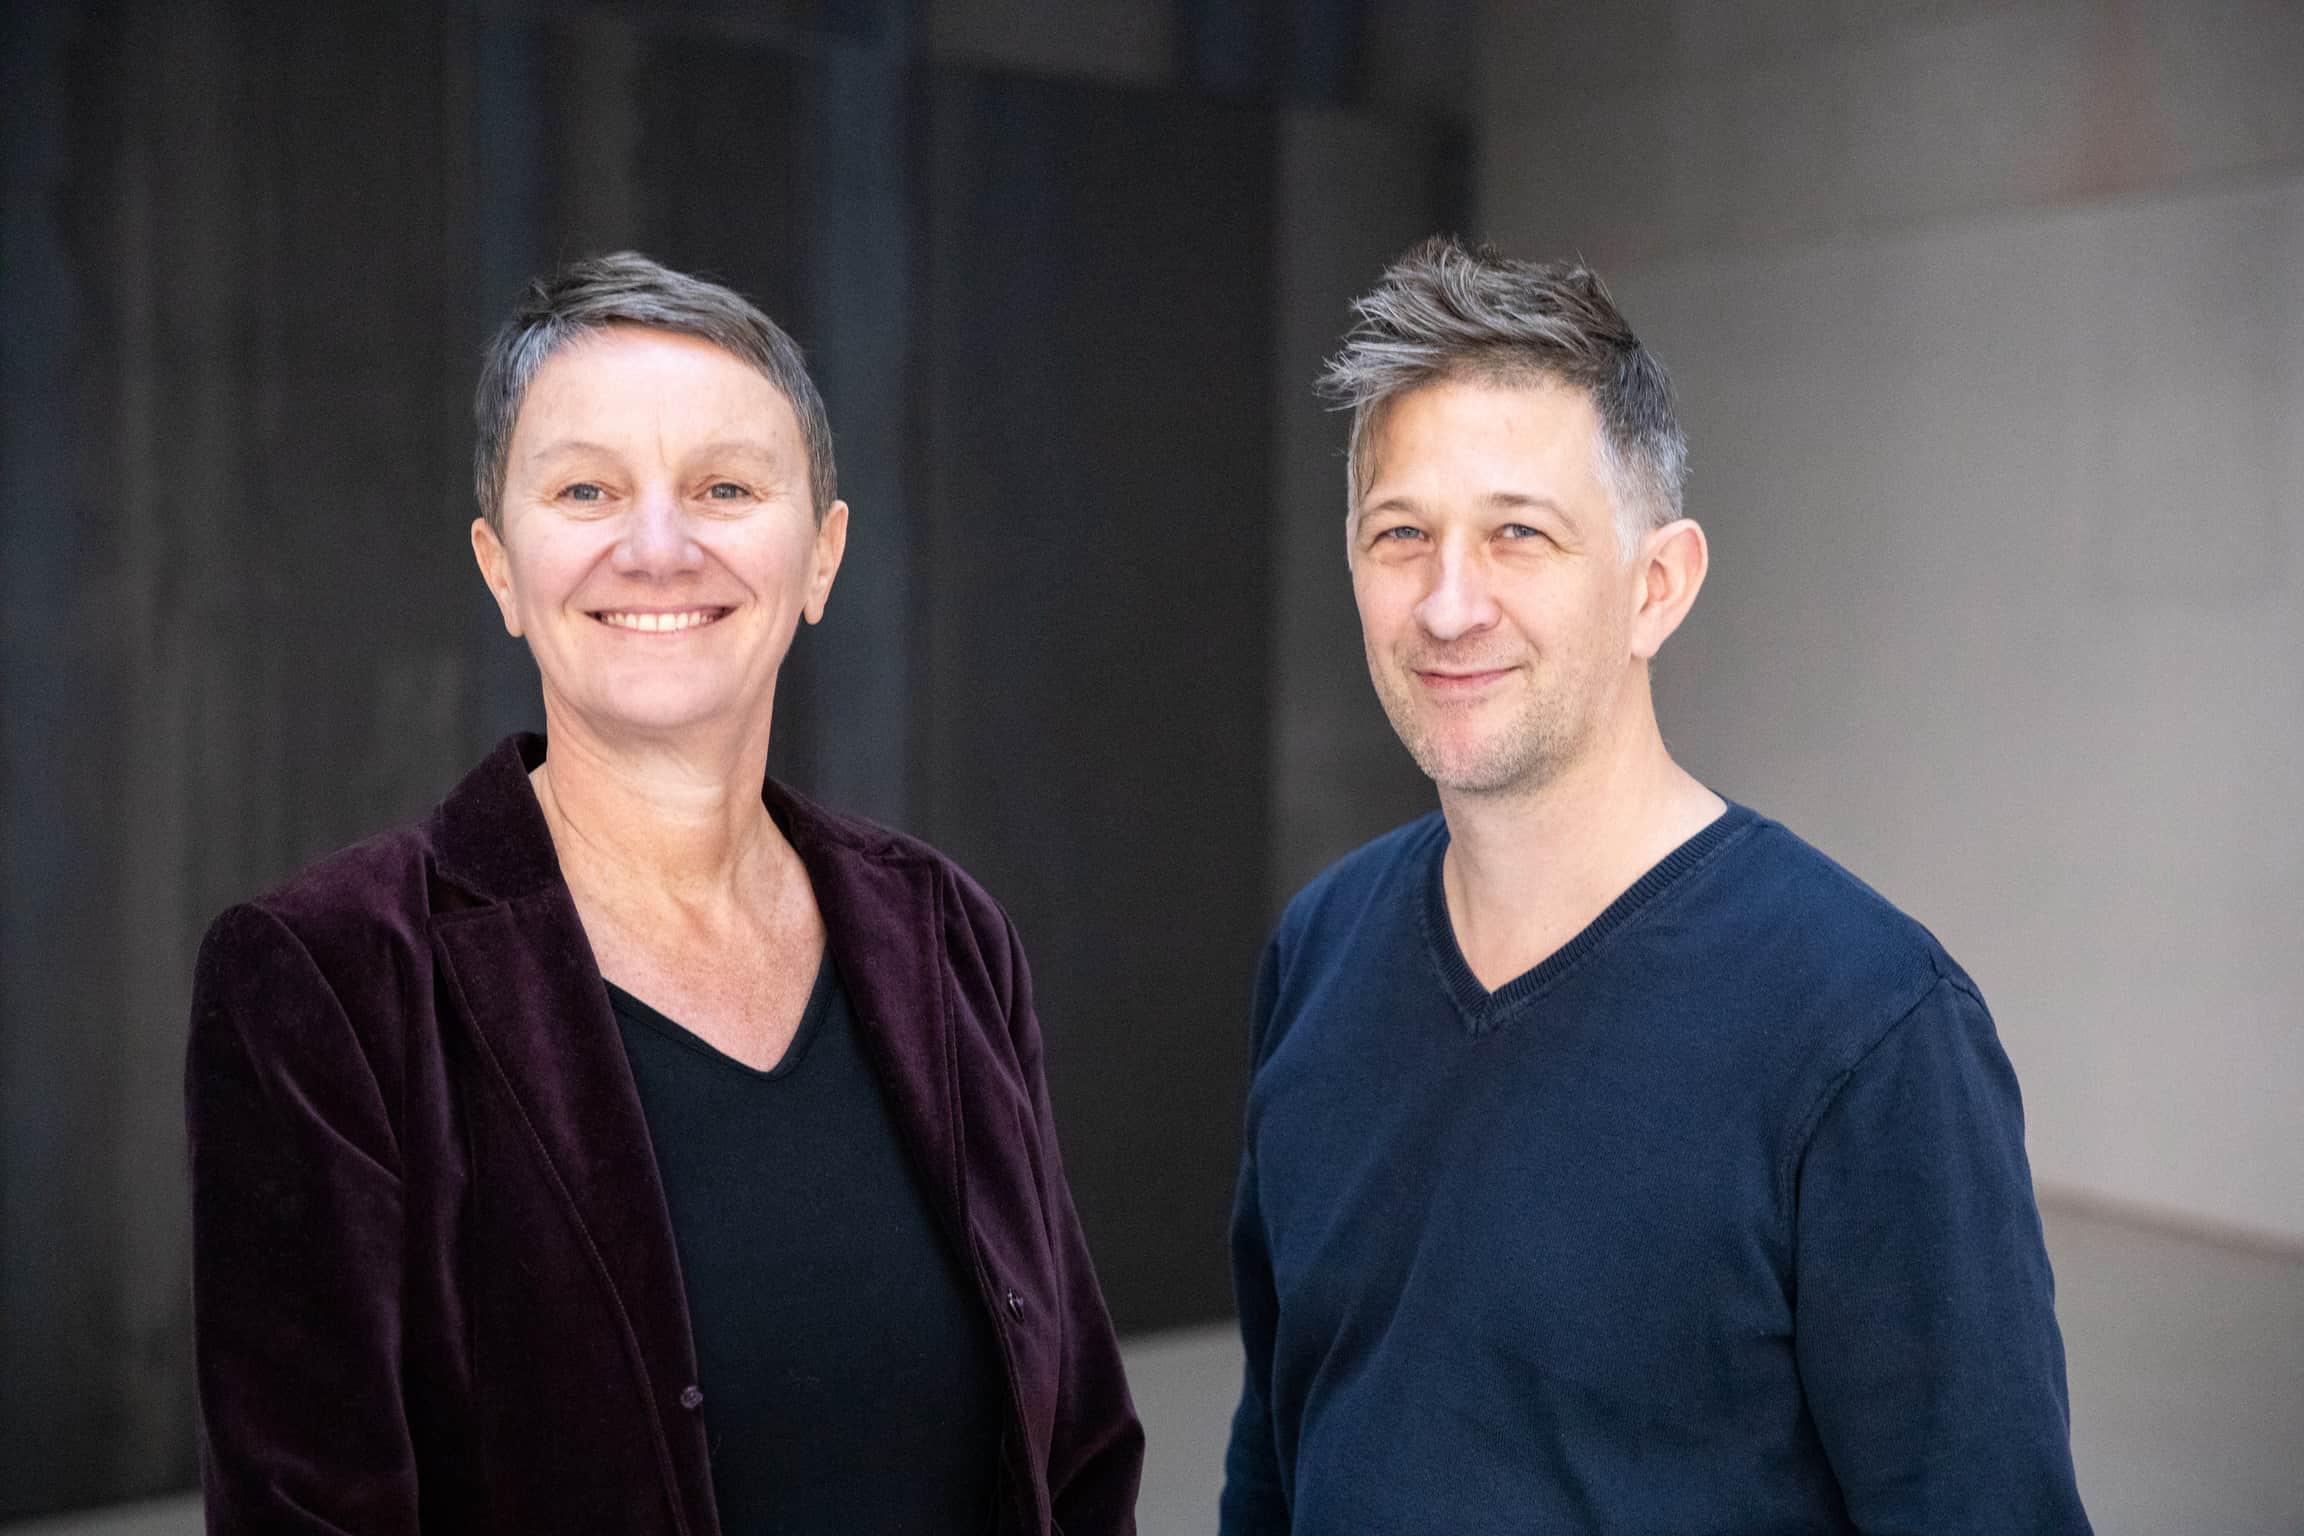 Sabine Zhang und Philipp Sonderegger Next Organizing - fotografiert von Chris Zvitkovits